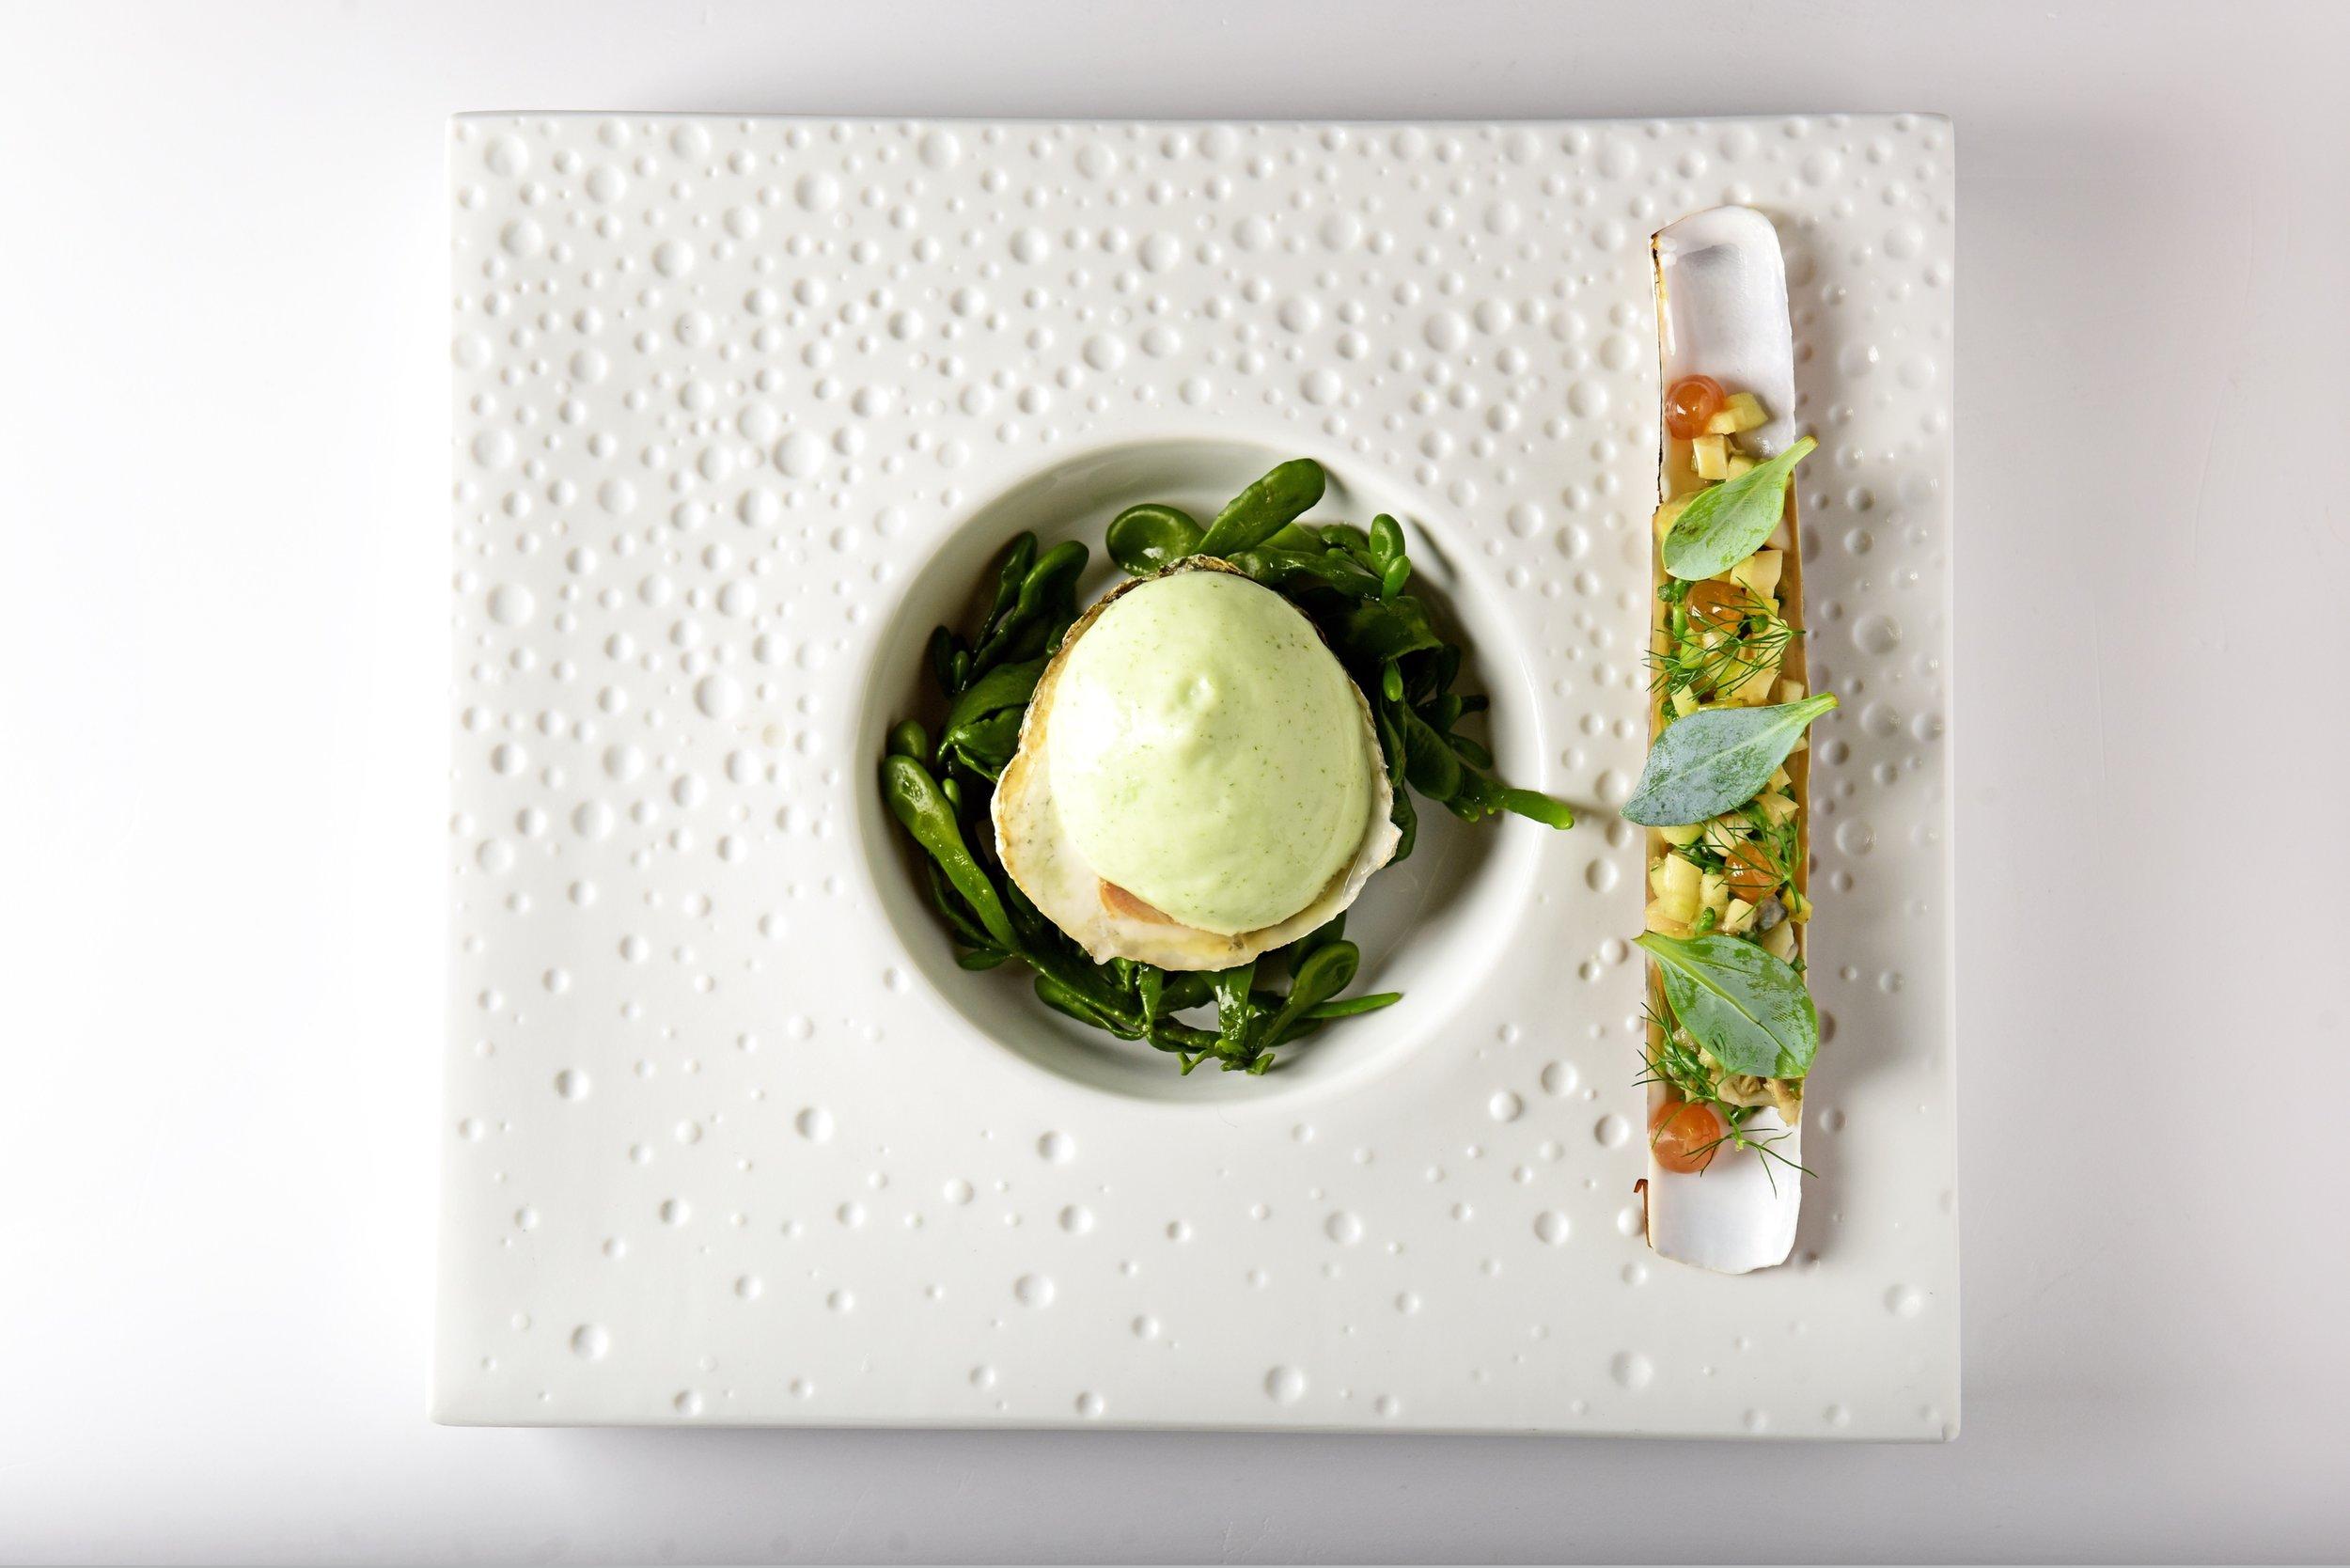 11 restaurant de bakermat ninove tablefever bart albrecht culinair fotograaf.jpg